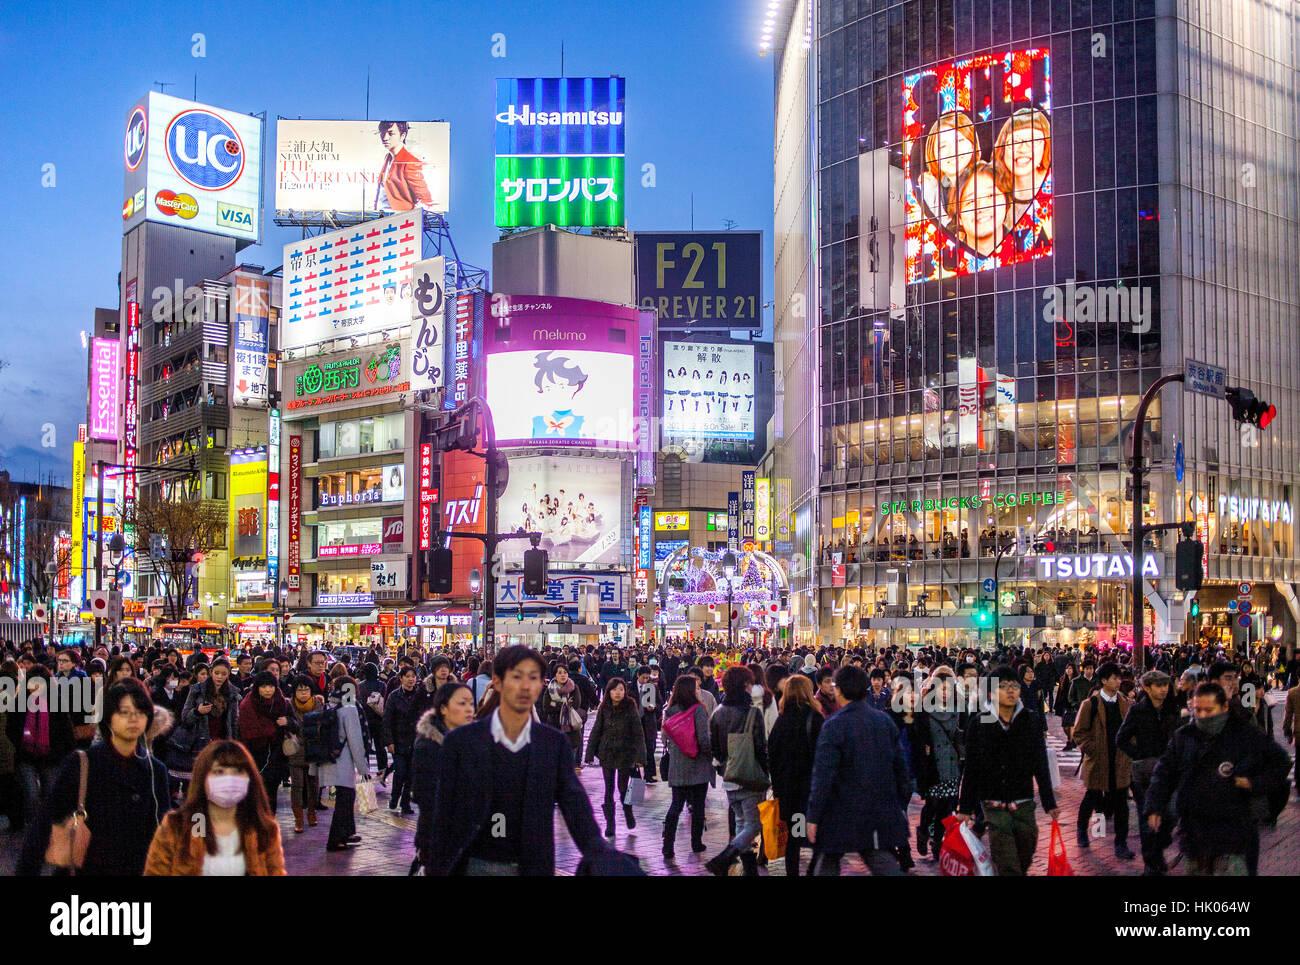 Townscape, Scramble Kousaten crossing in Hachiko square, Shibuya, Tokyo, Japan - Stock Image